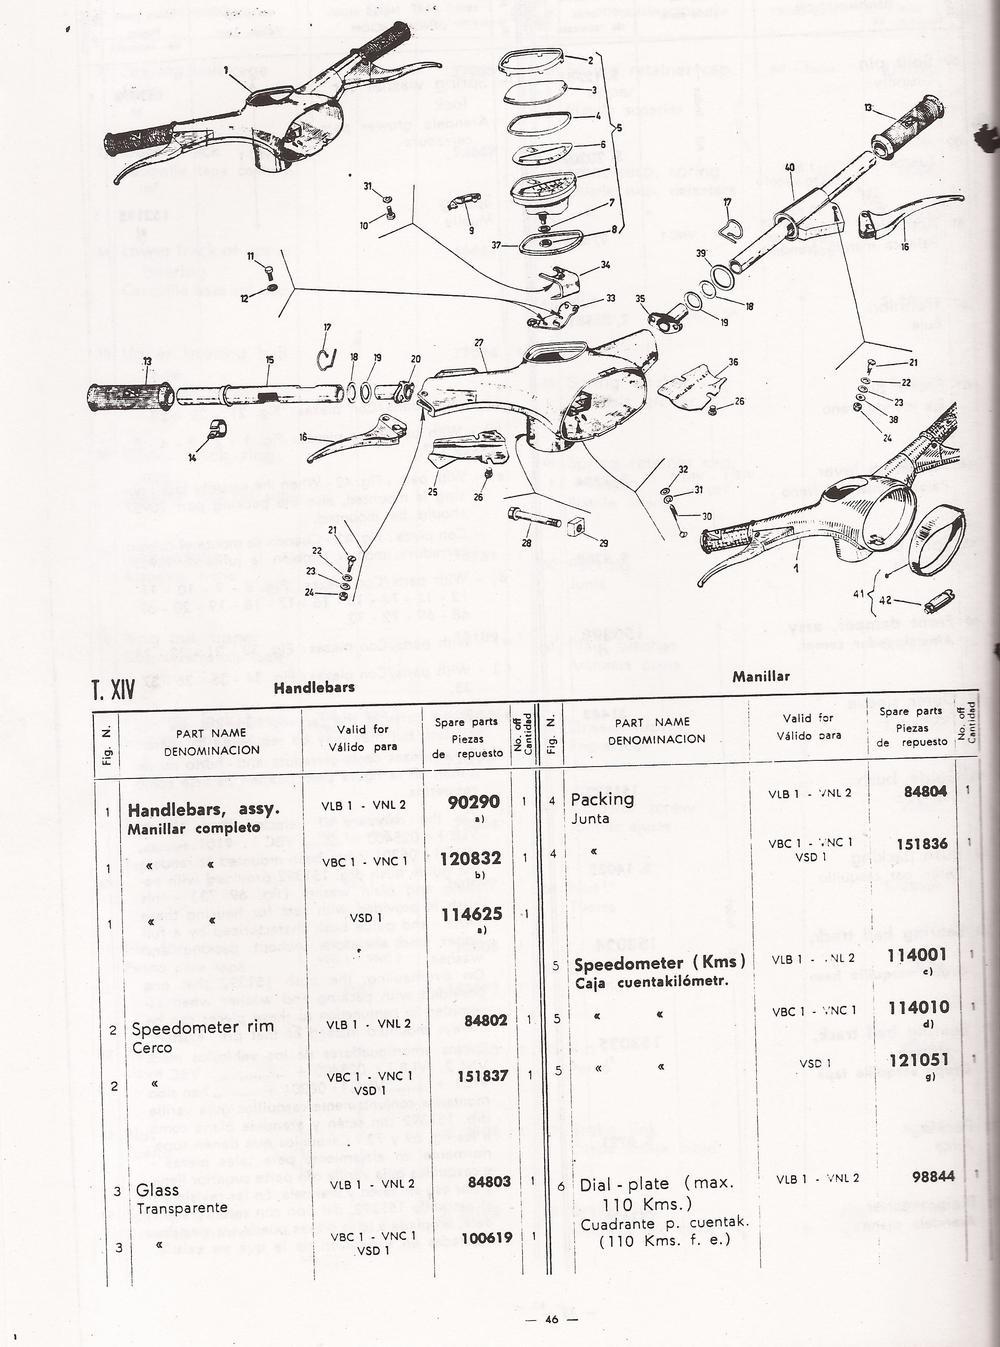 02-25-2013 vespa manaul 52.jpg